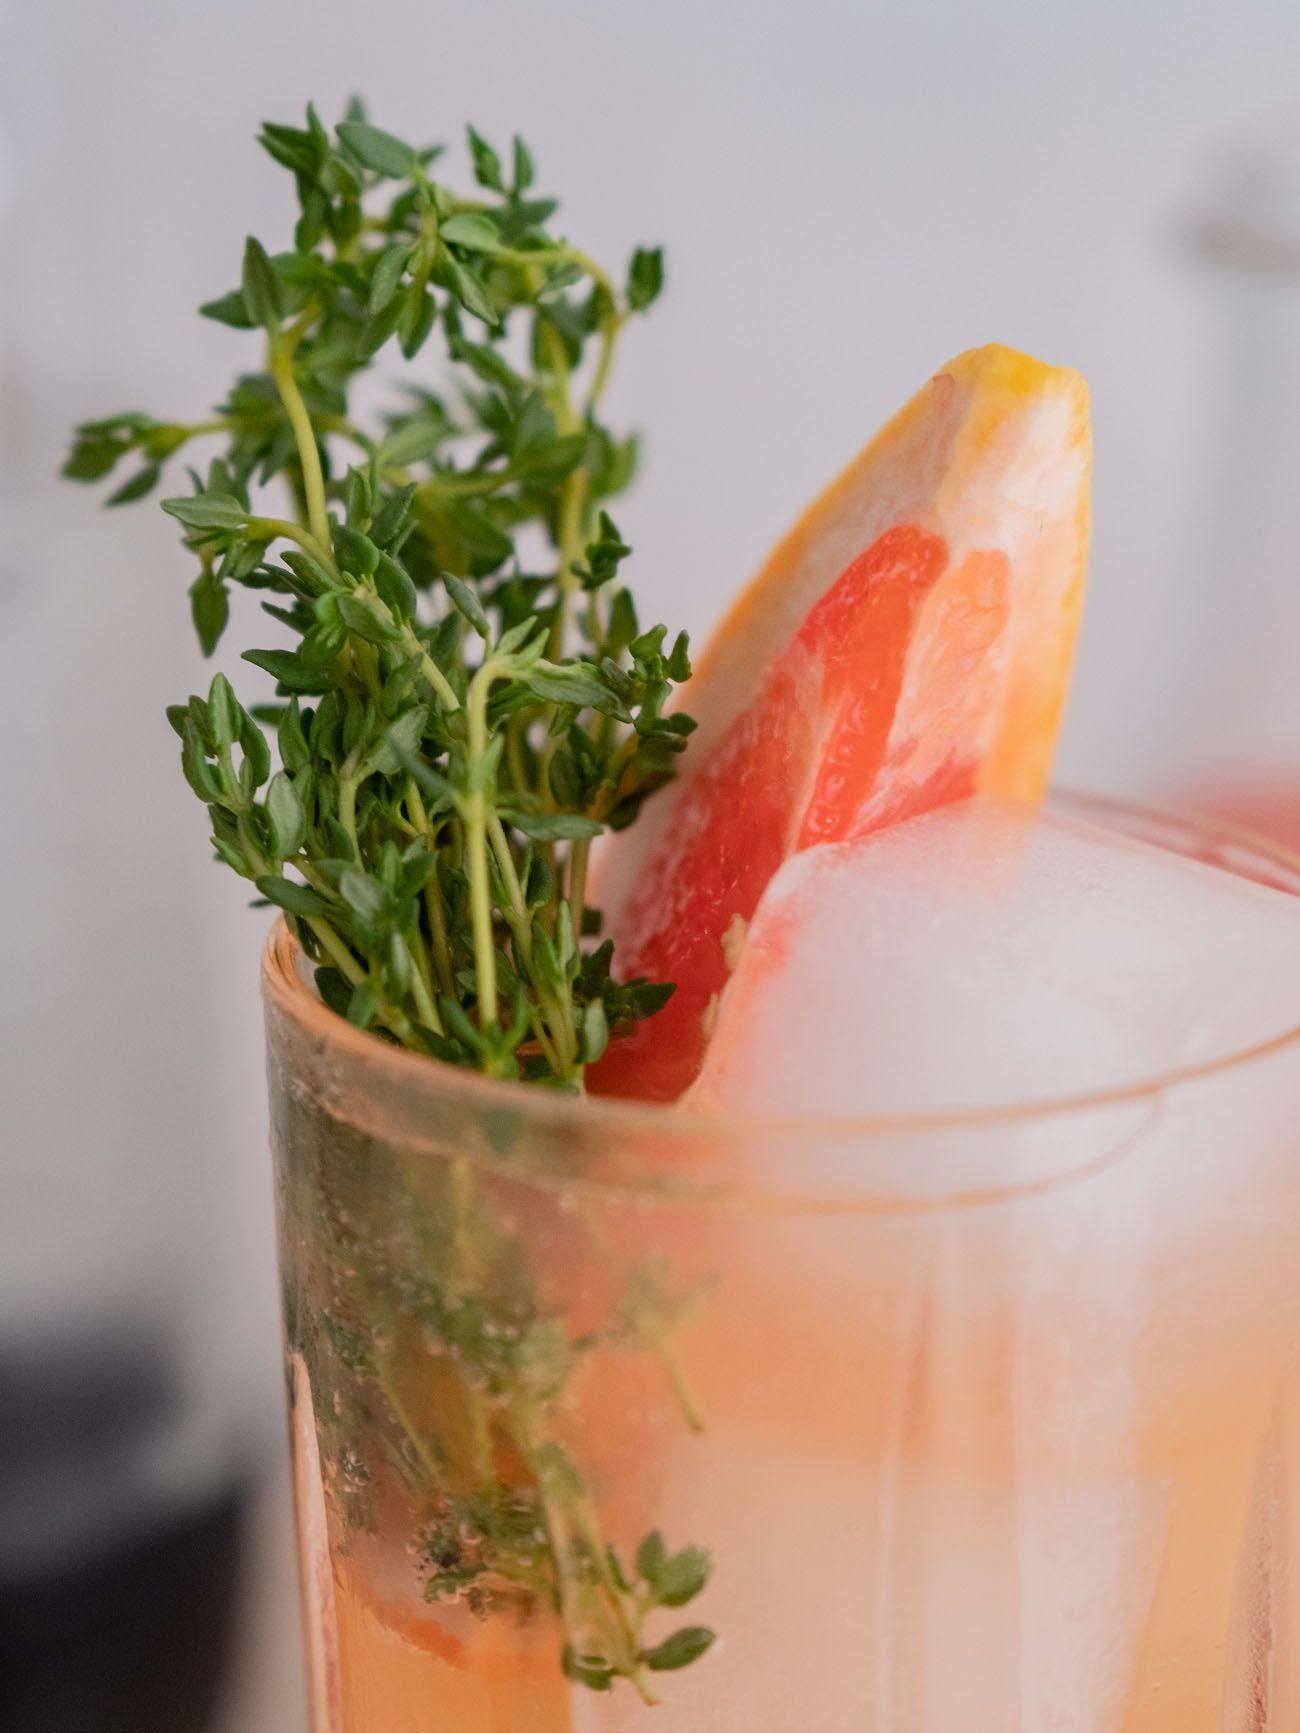 Foodblog, About Fuel, Soda Stream, Sirup, Rezept, Pink Grapefruit mit Thymian, Limonade